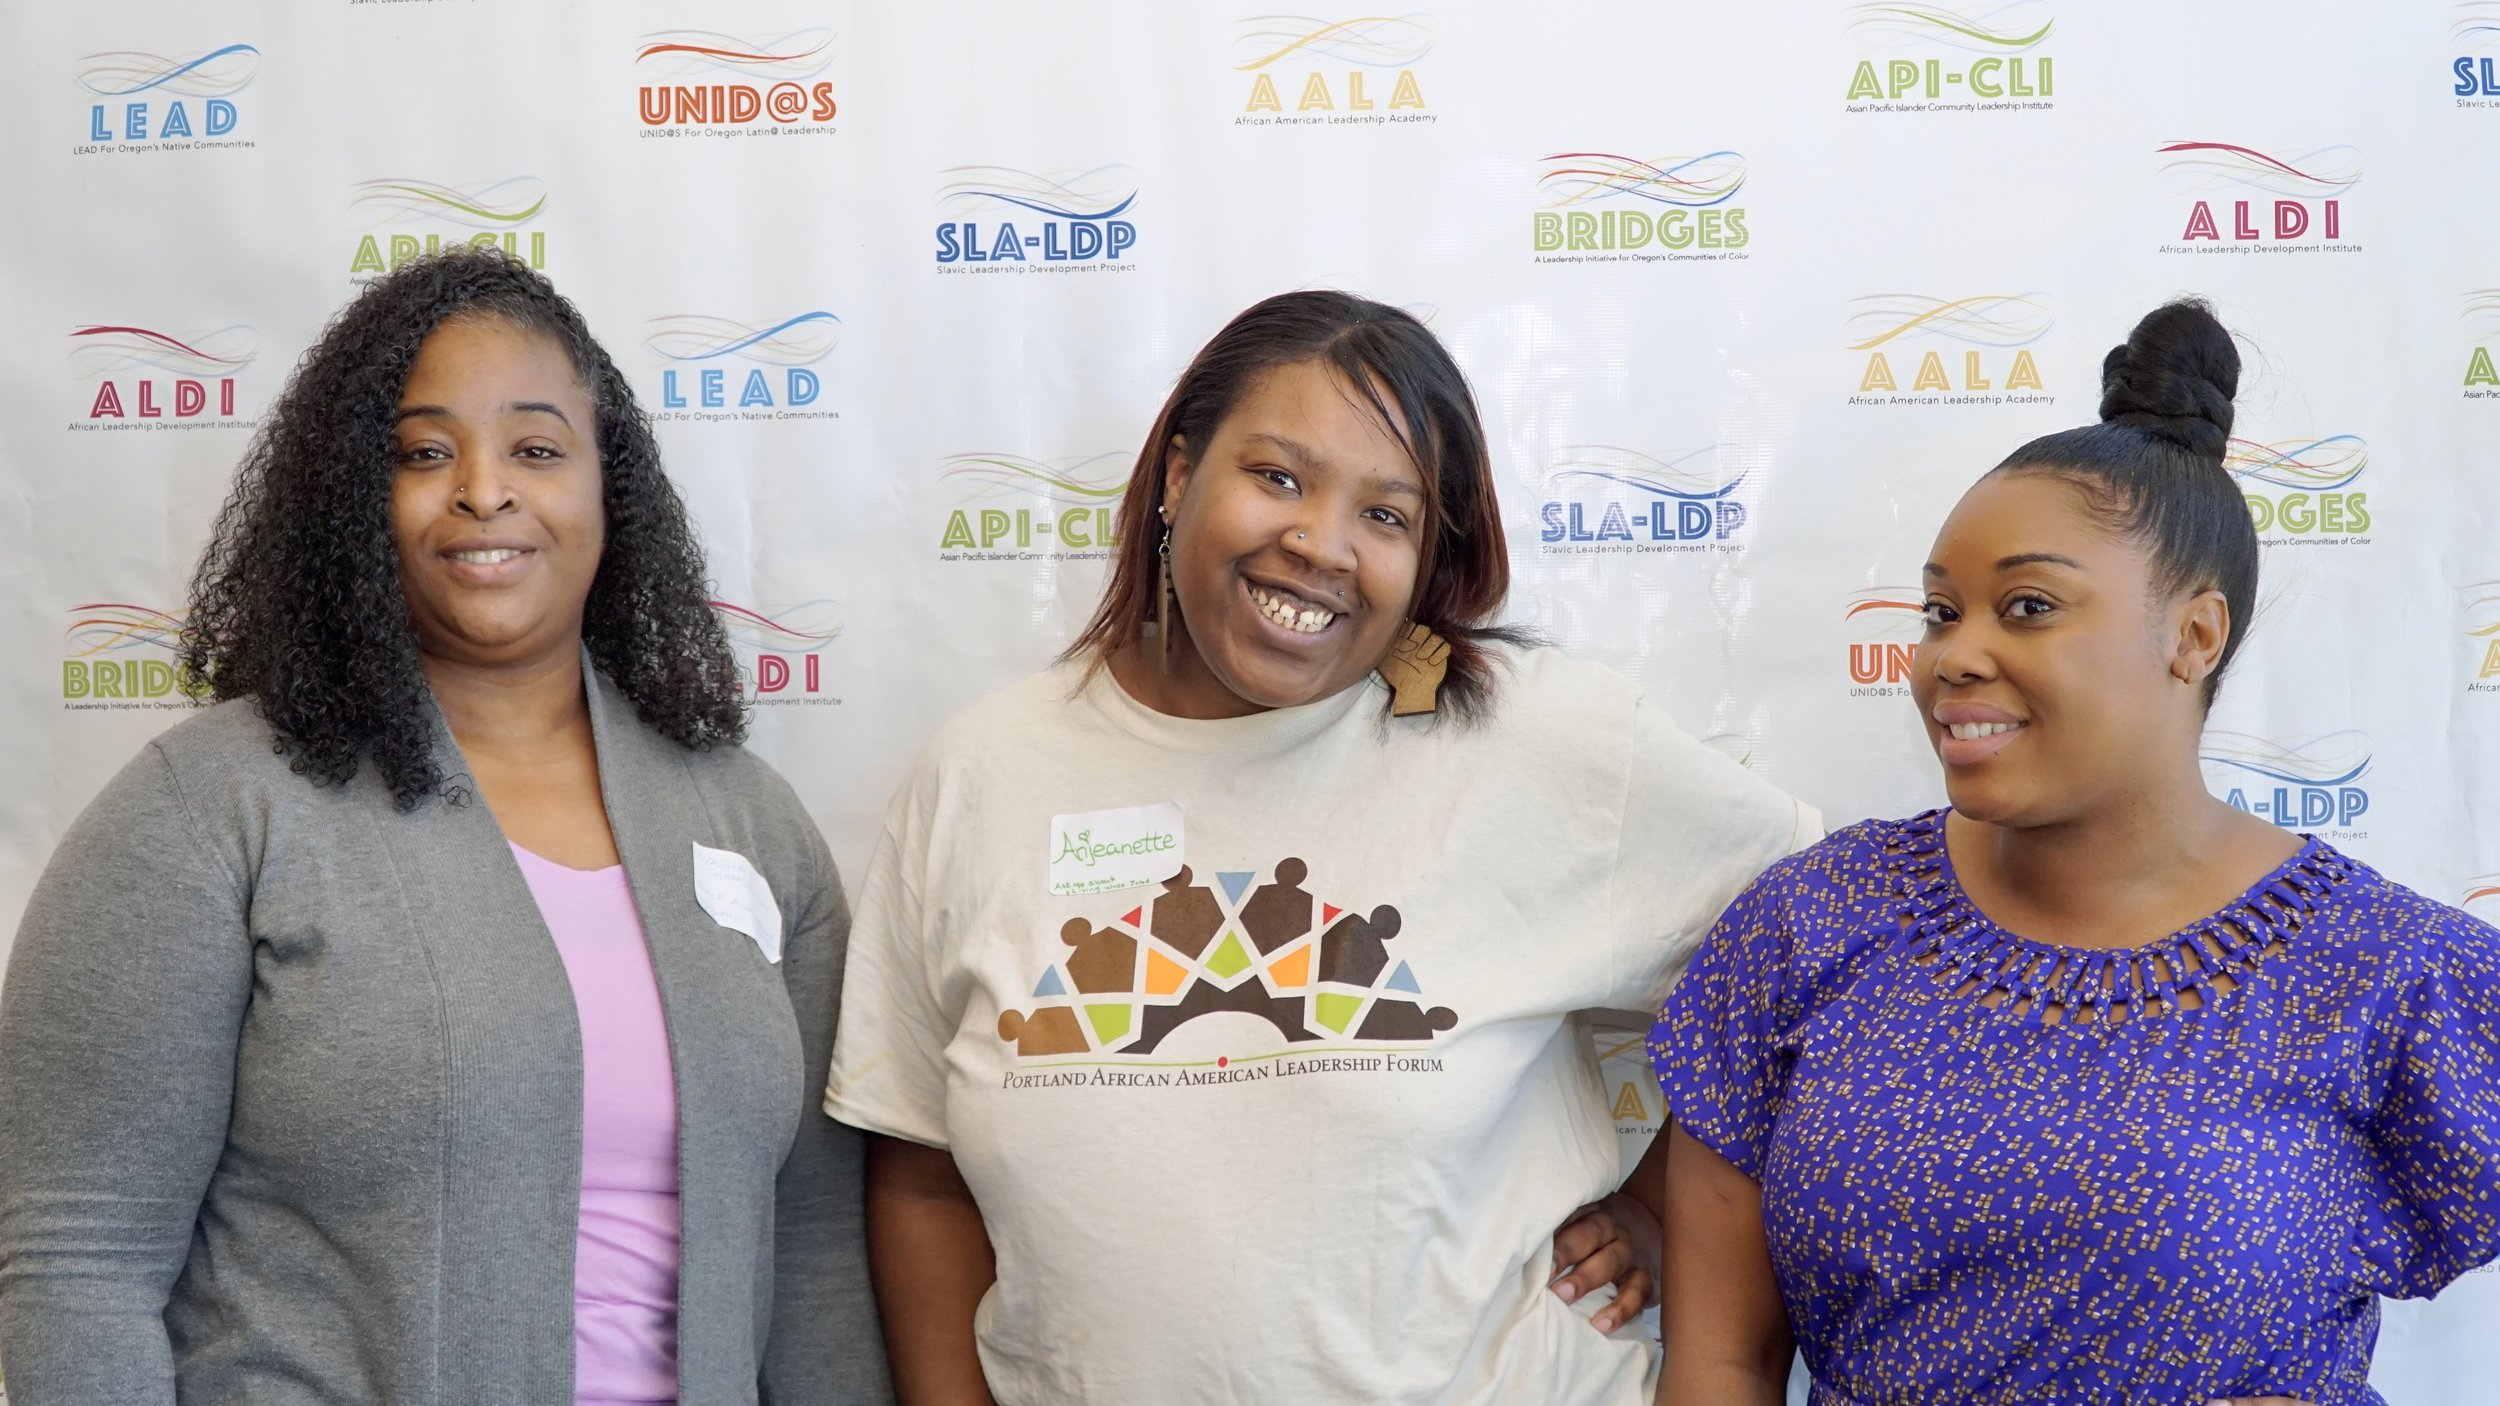 African American Leadership Academy (AALF)